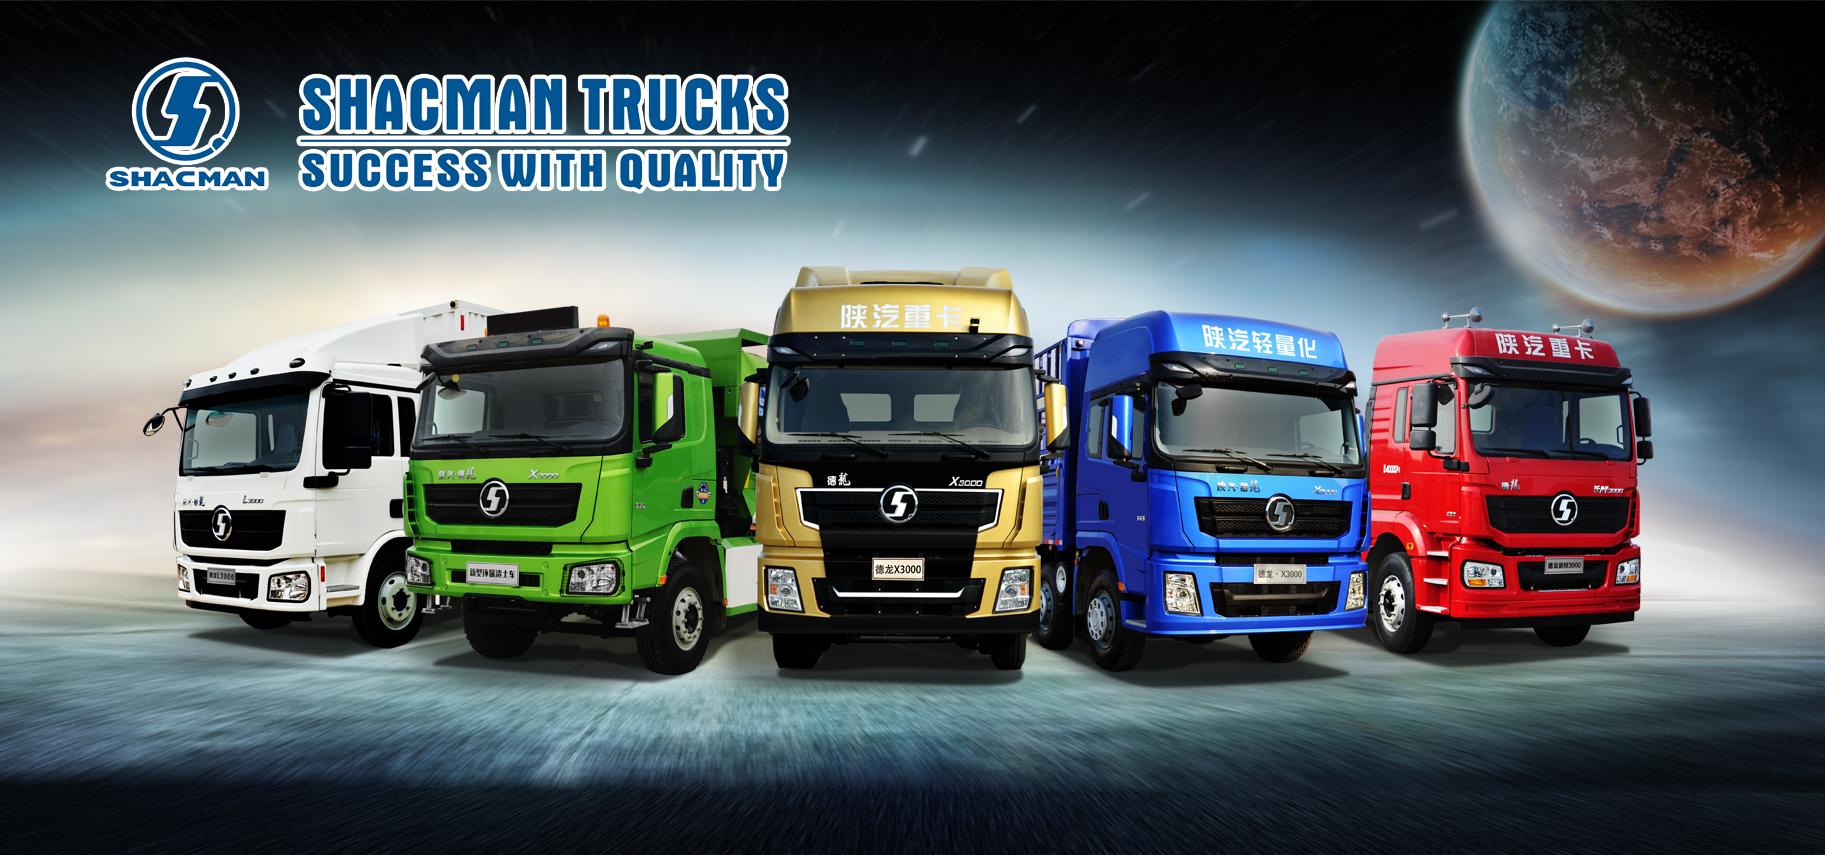 shacman trucks